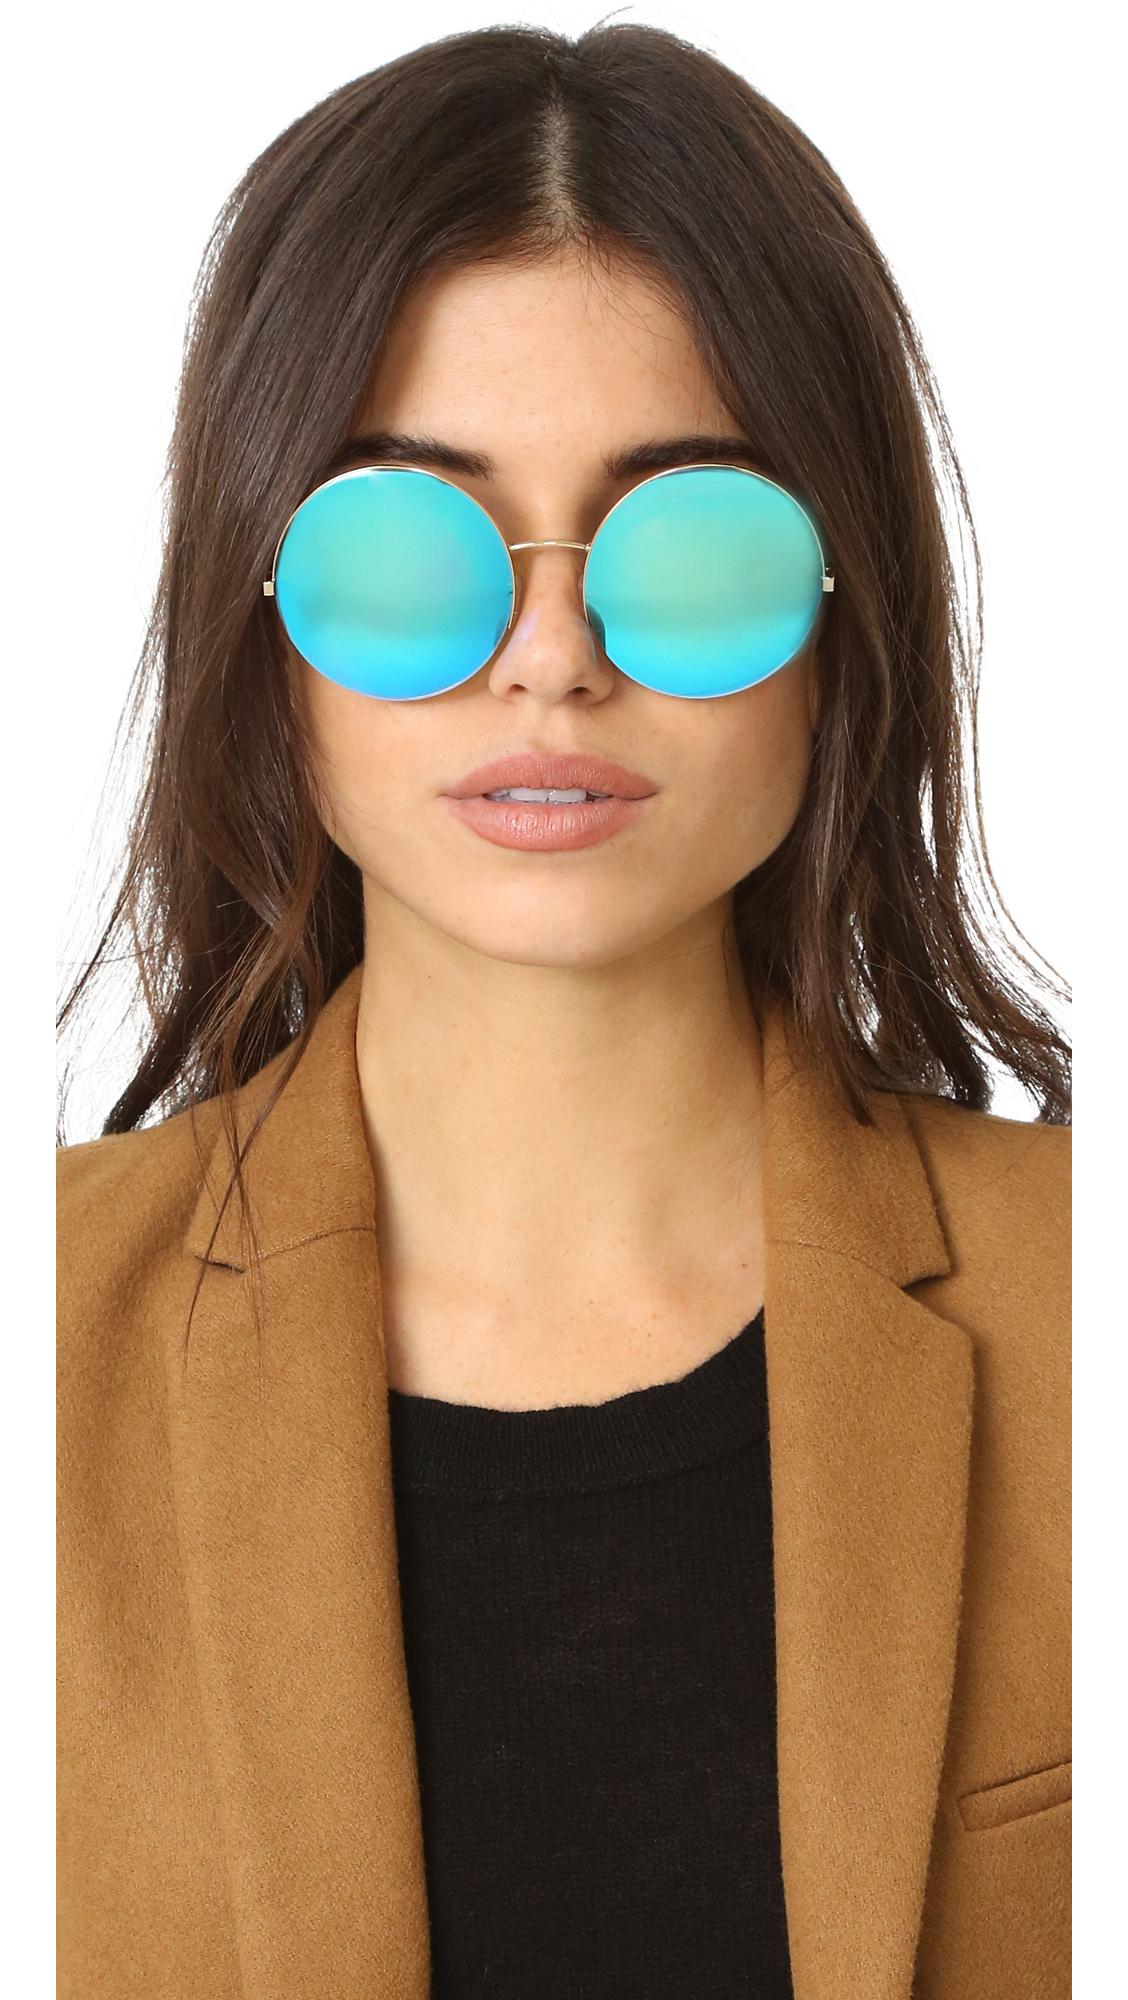 bb83839d141f Victoria Beckham Supra Round Sunglasses